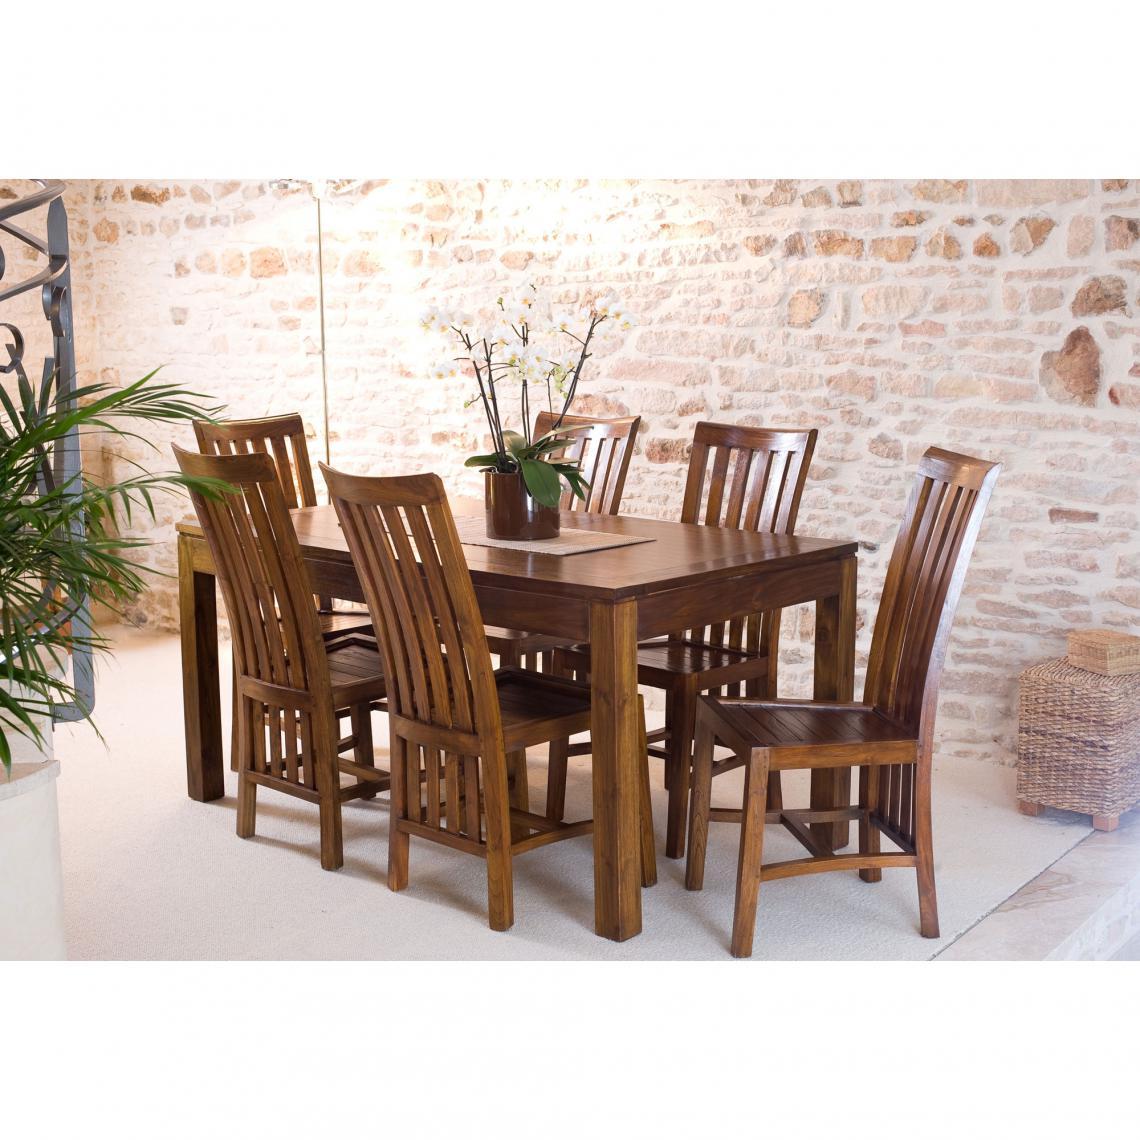 table manger rectangulaire avec allonge 160x200 cm en bois mindi